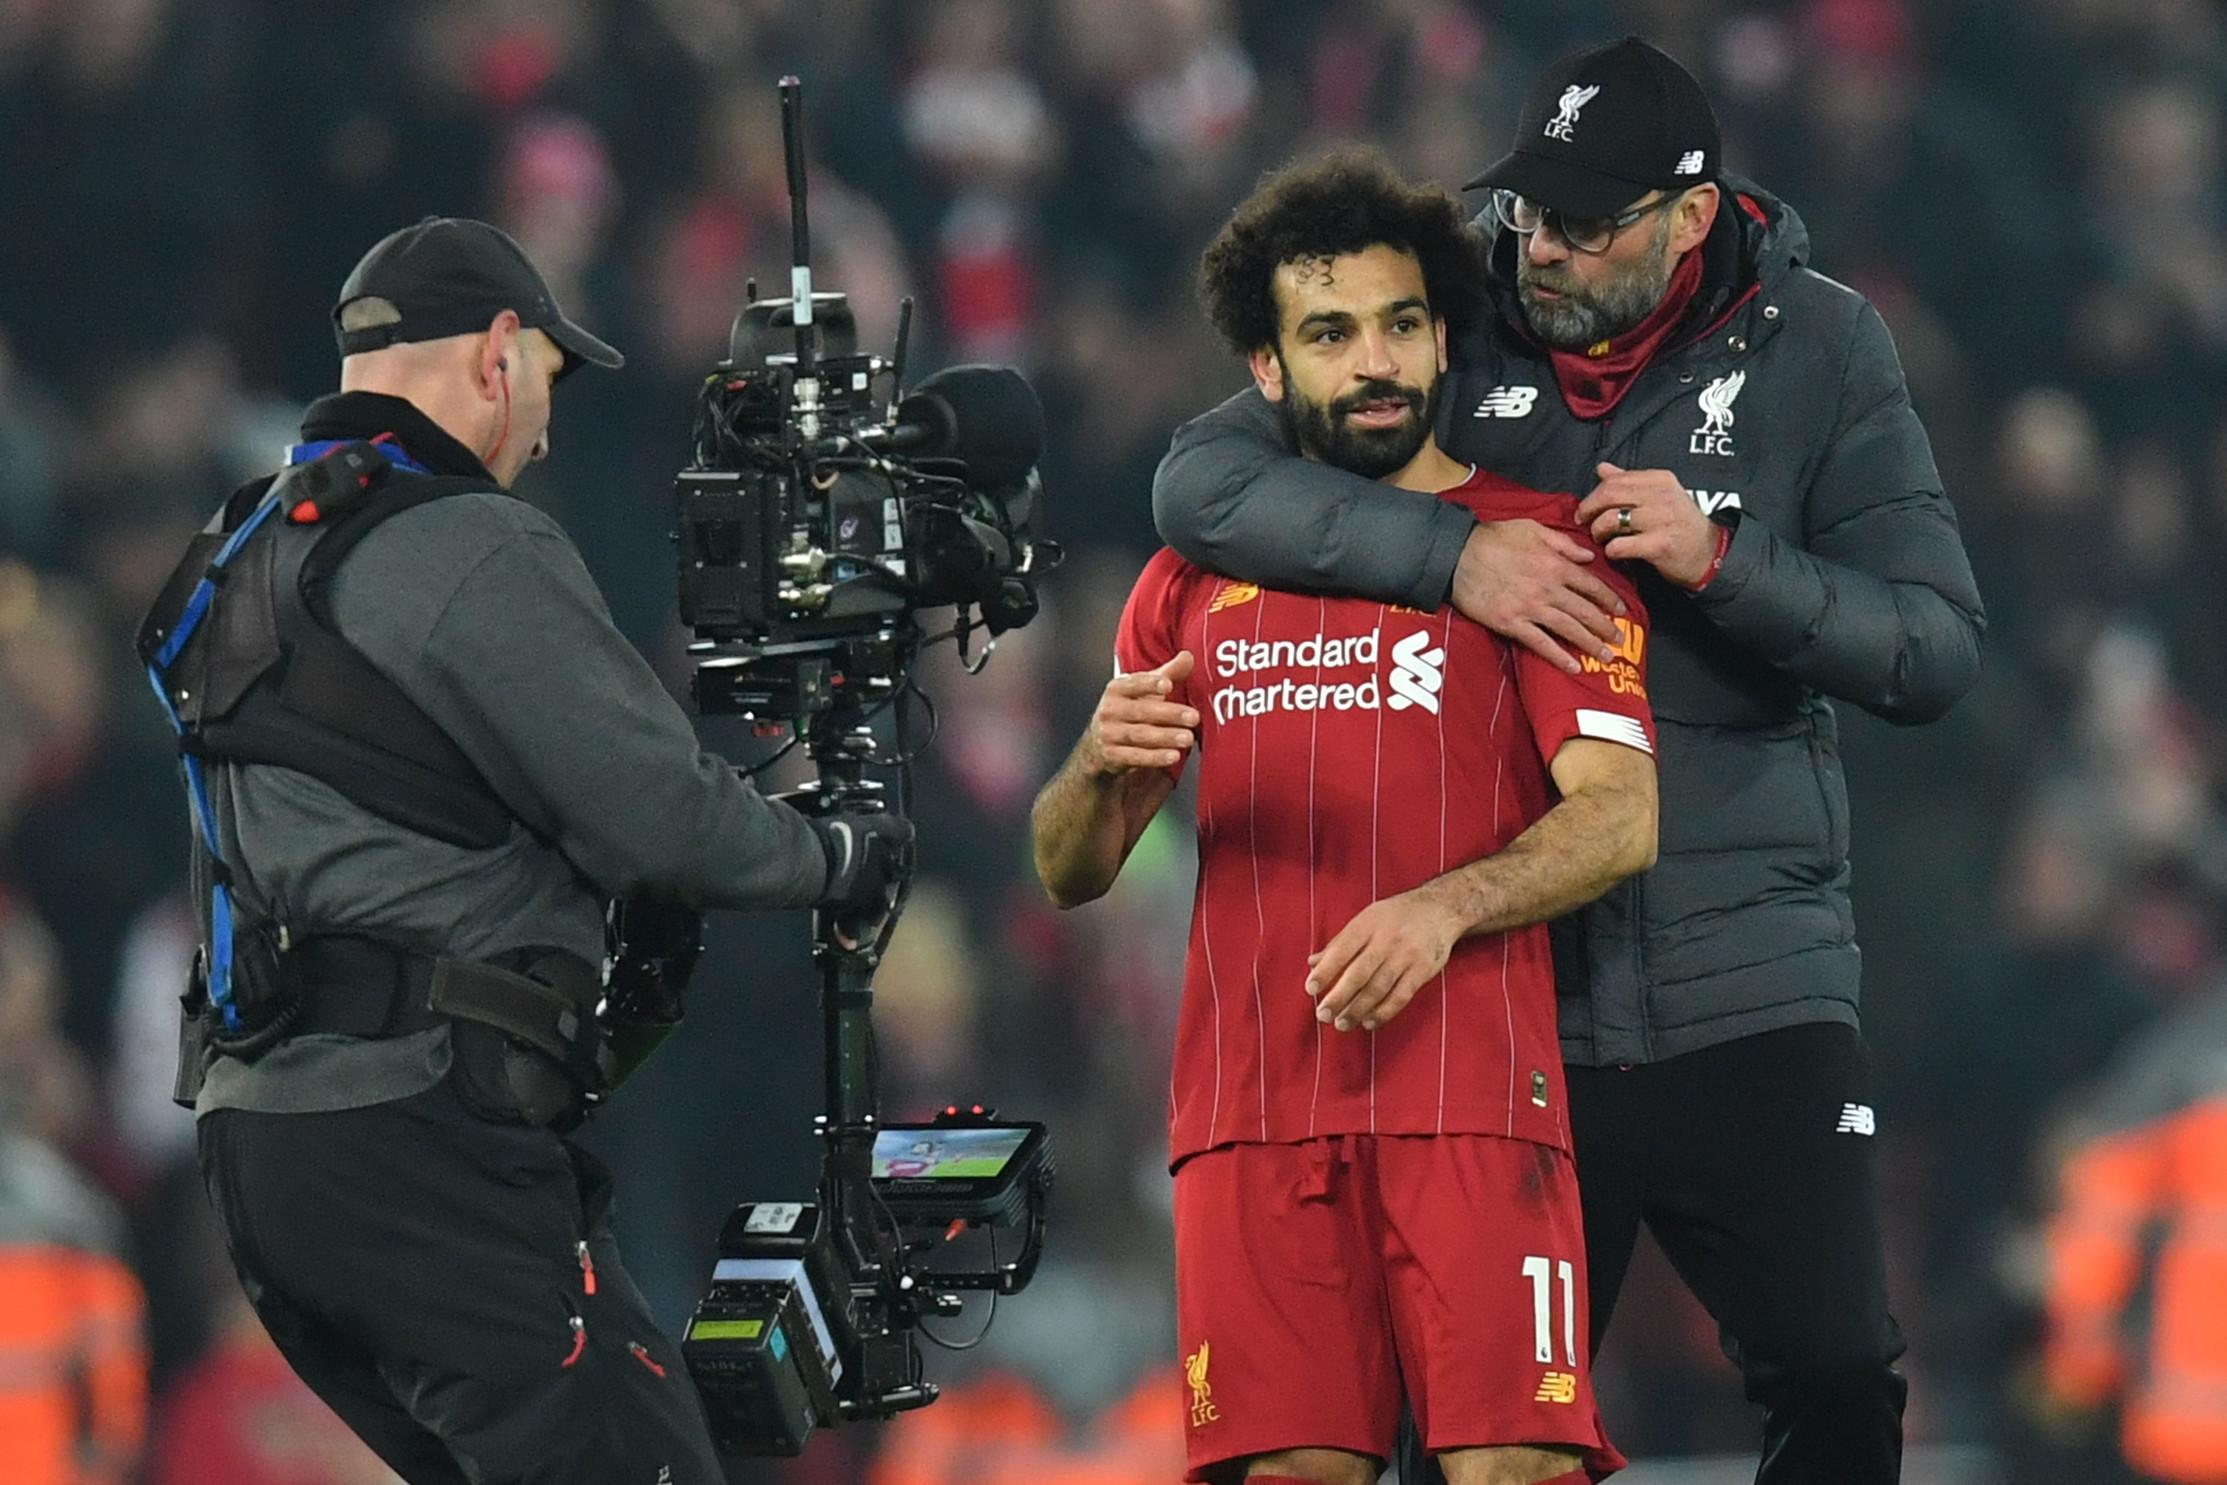 19 gennaio 2020: Klopp abbraccia Salah dopo Liverpool-Manchester United